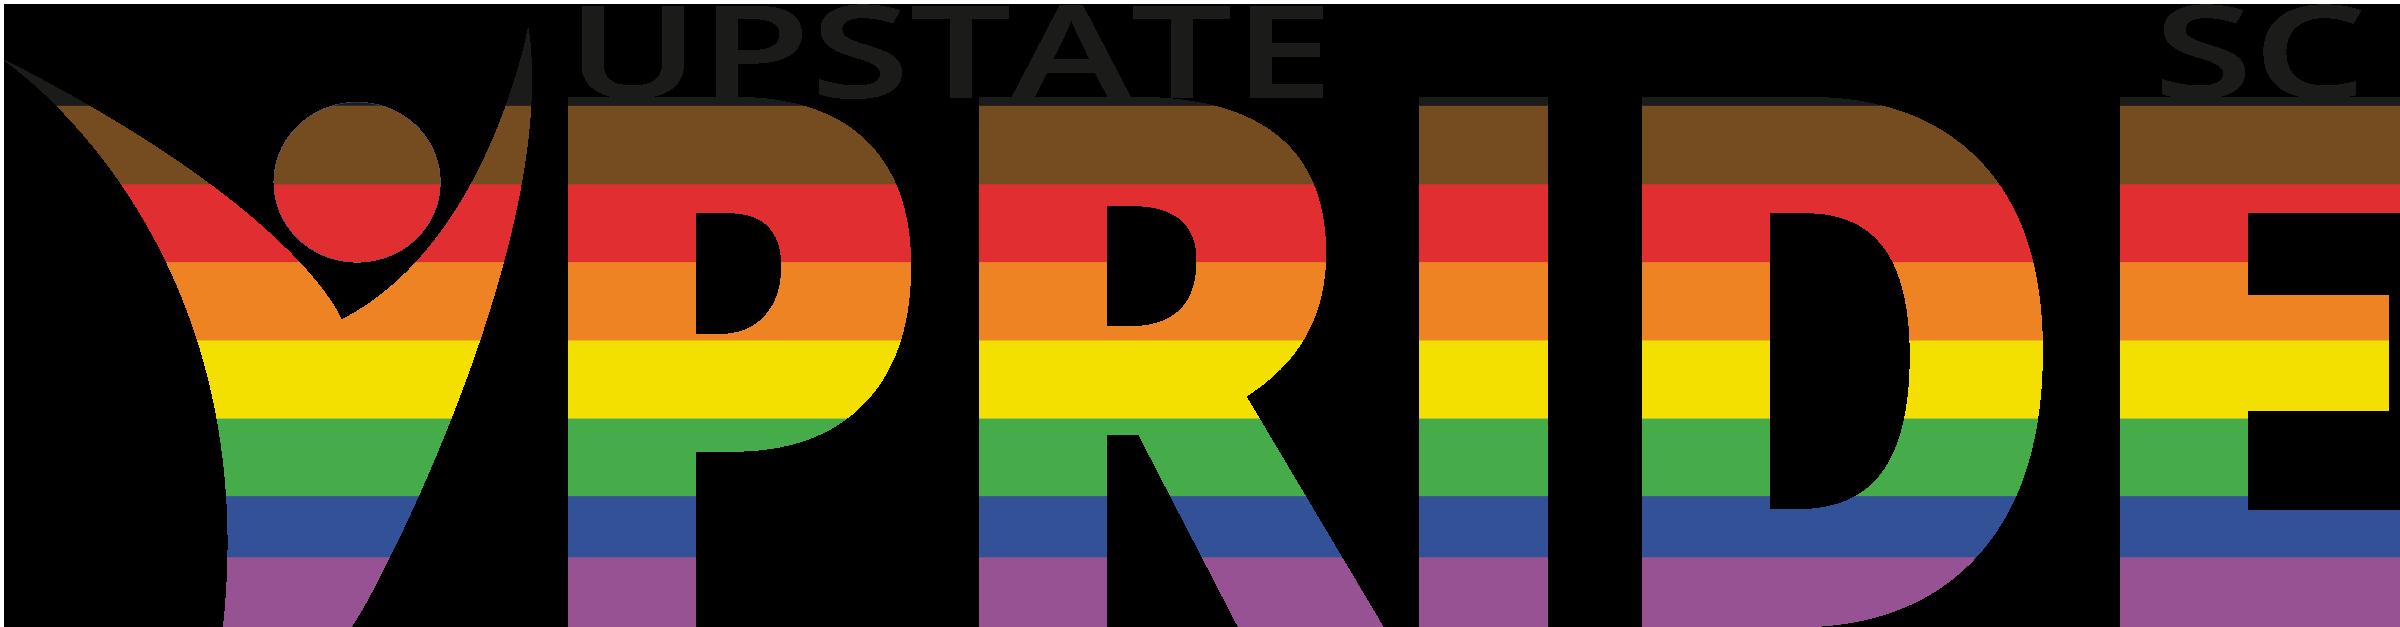 Upstate_Pride_Logo png.png